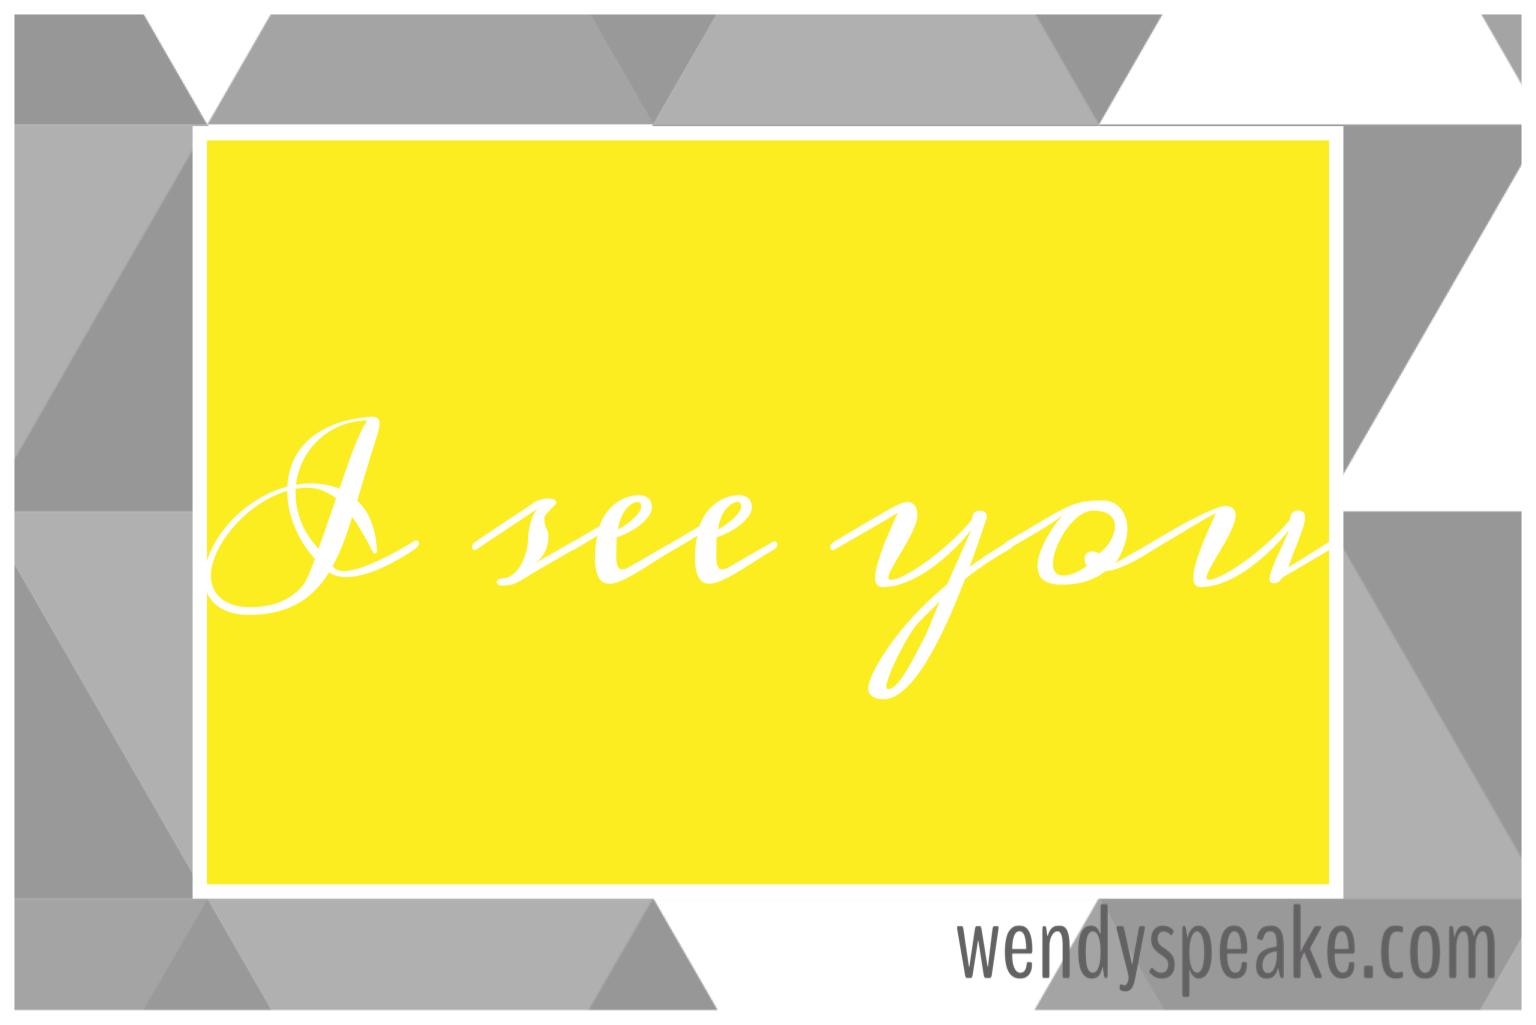 I-see-you-image.jpg